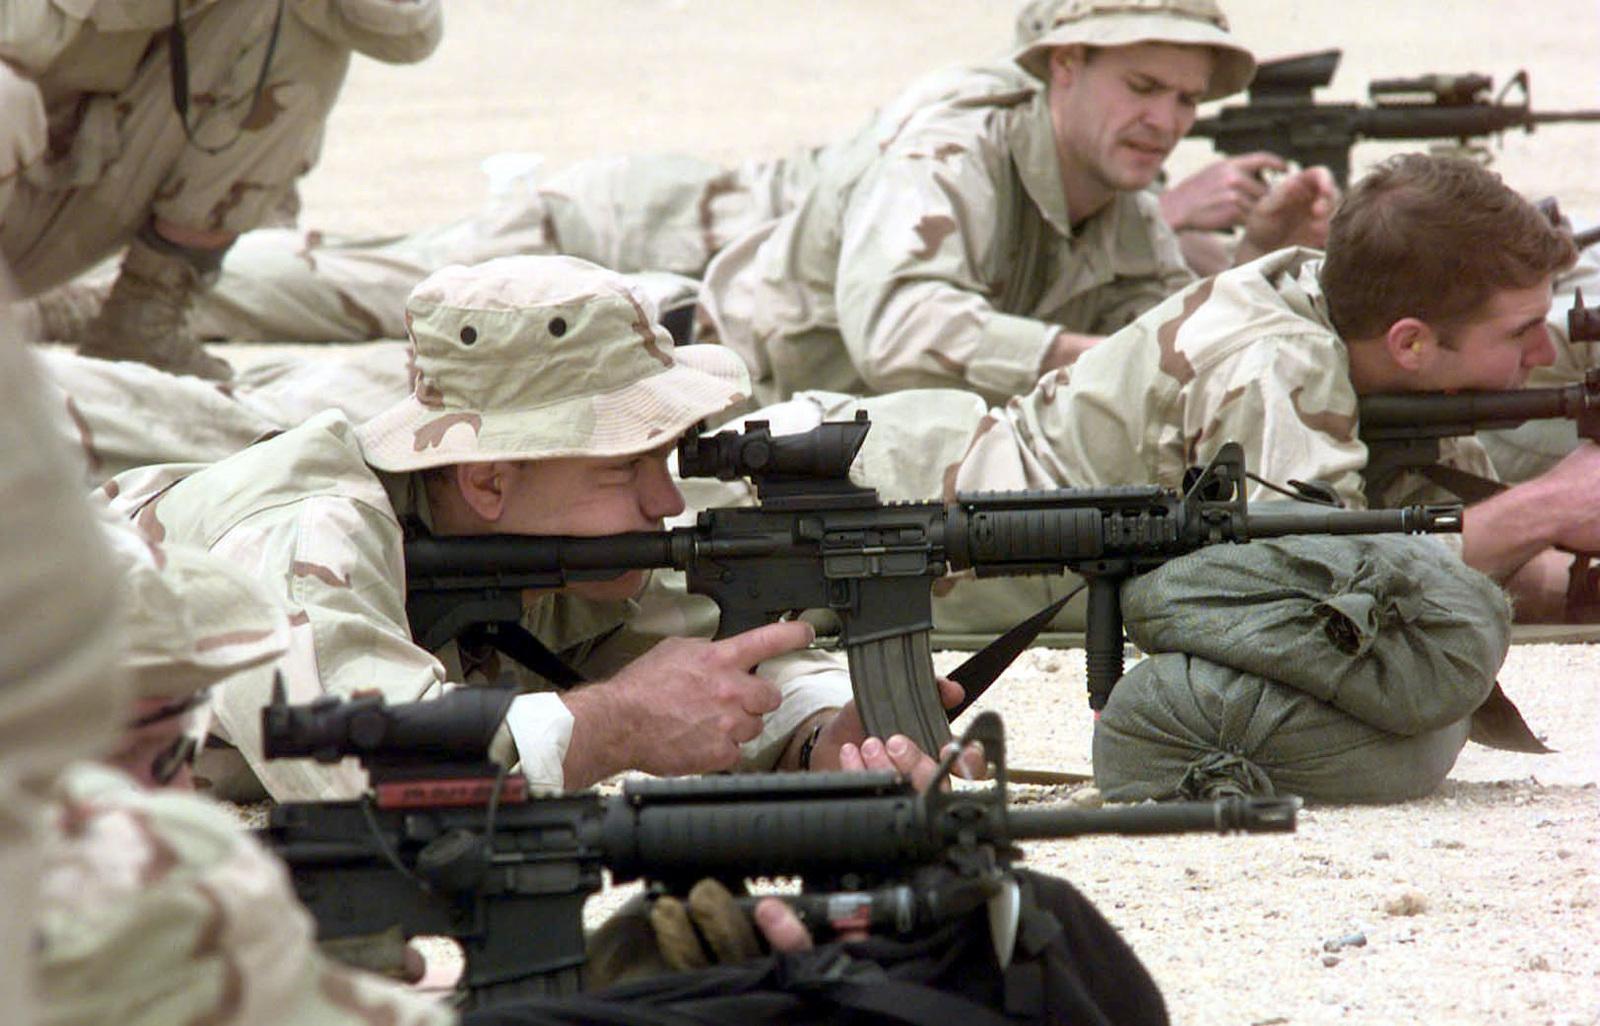 US Navy SEALS, from SEAL Team 8, shoot Colt 5 56mm M-4